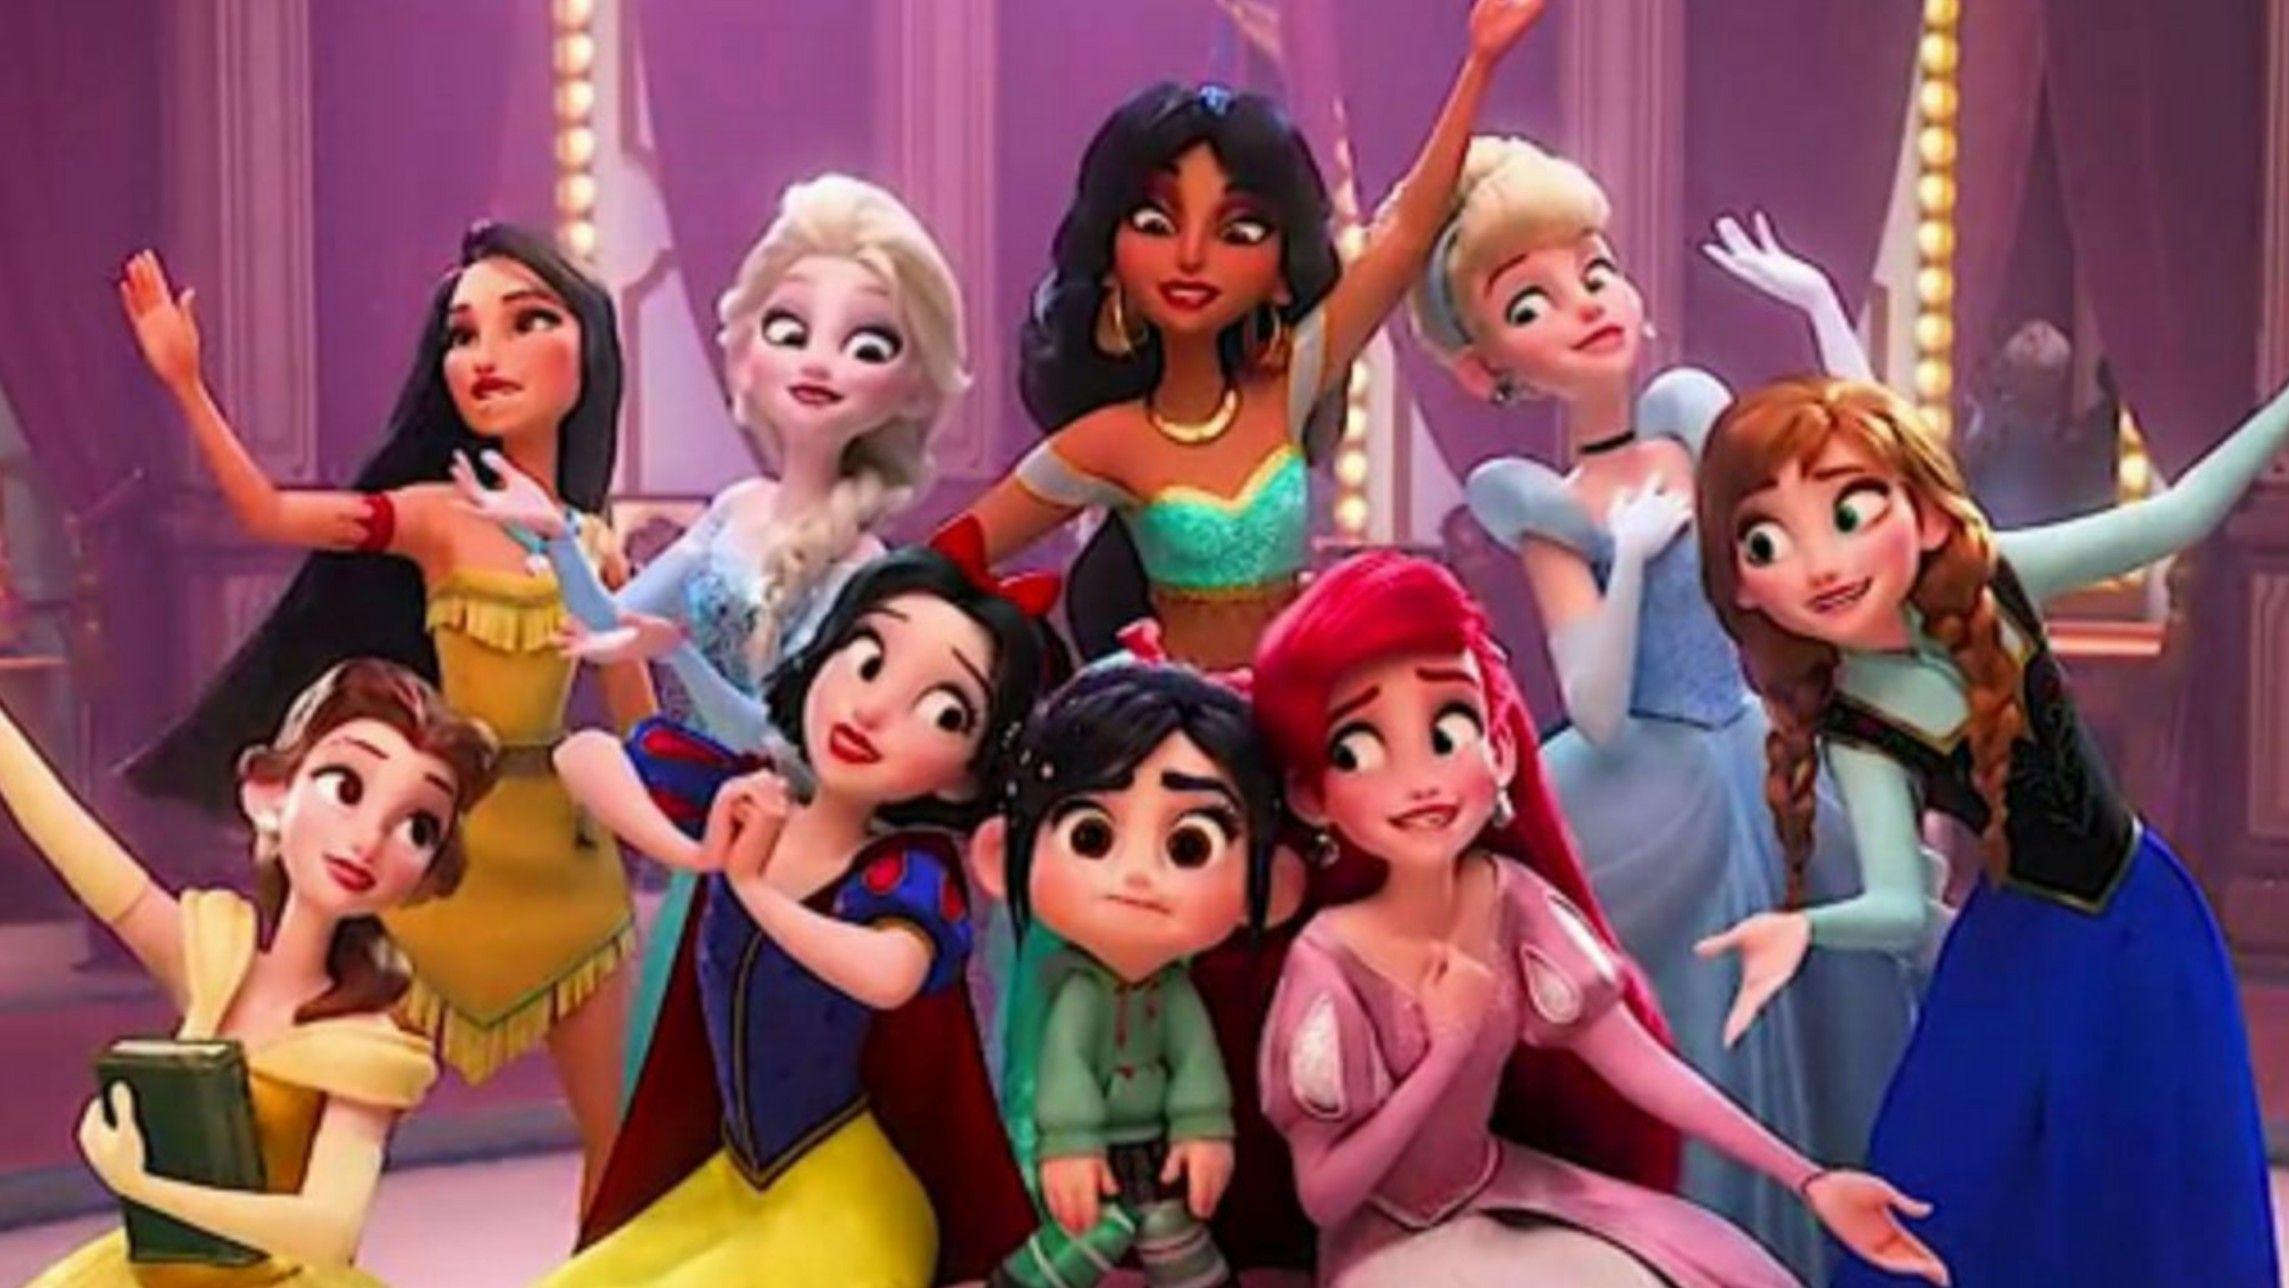 Header Wallpaper Para Notebook En 2020 Princesas Disney Princesas Disney Tatuadas Fotos De Princesas Disney